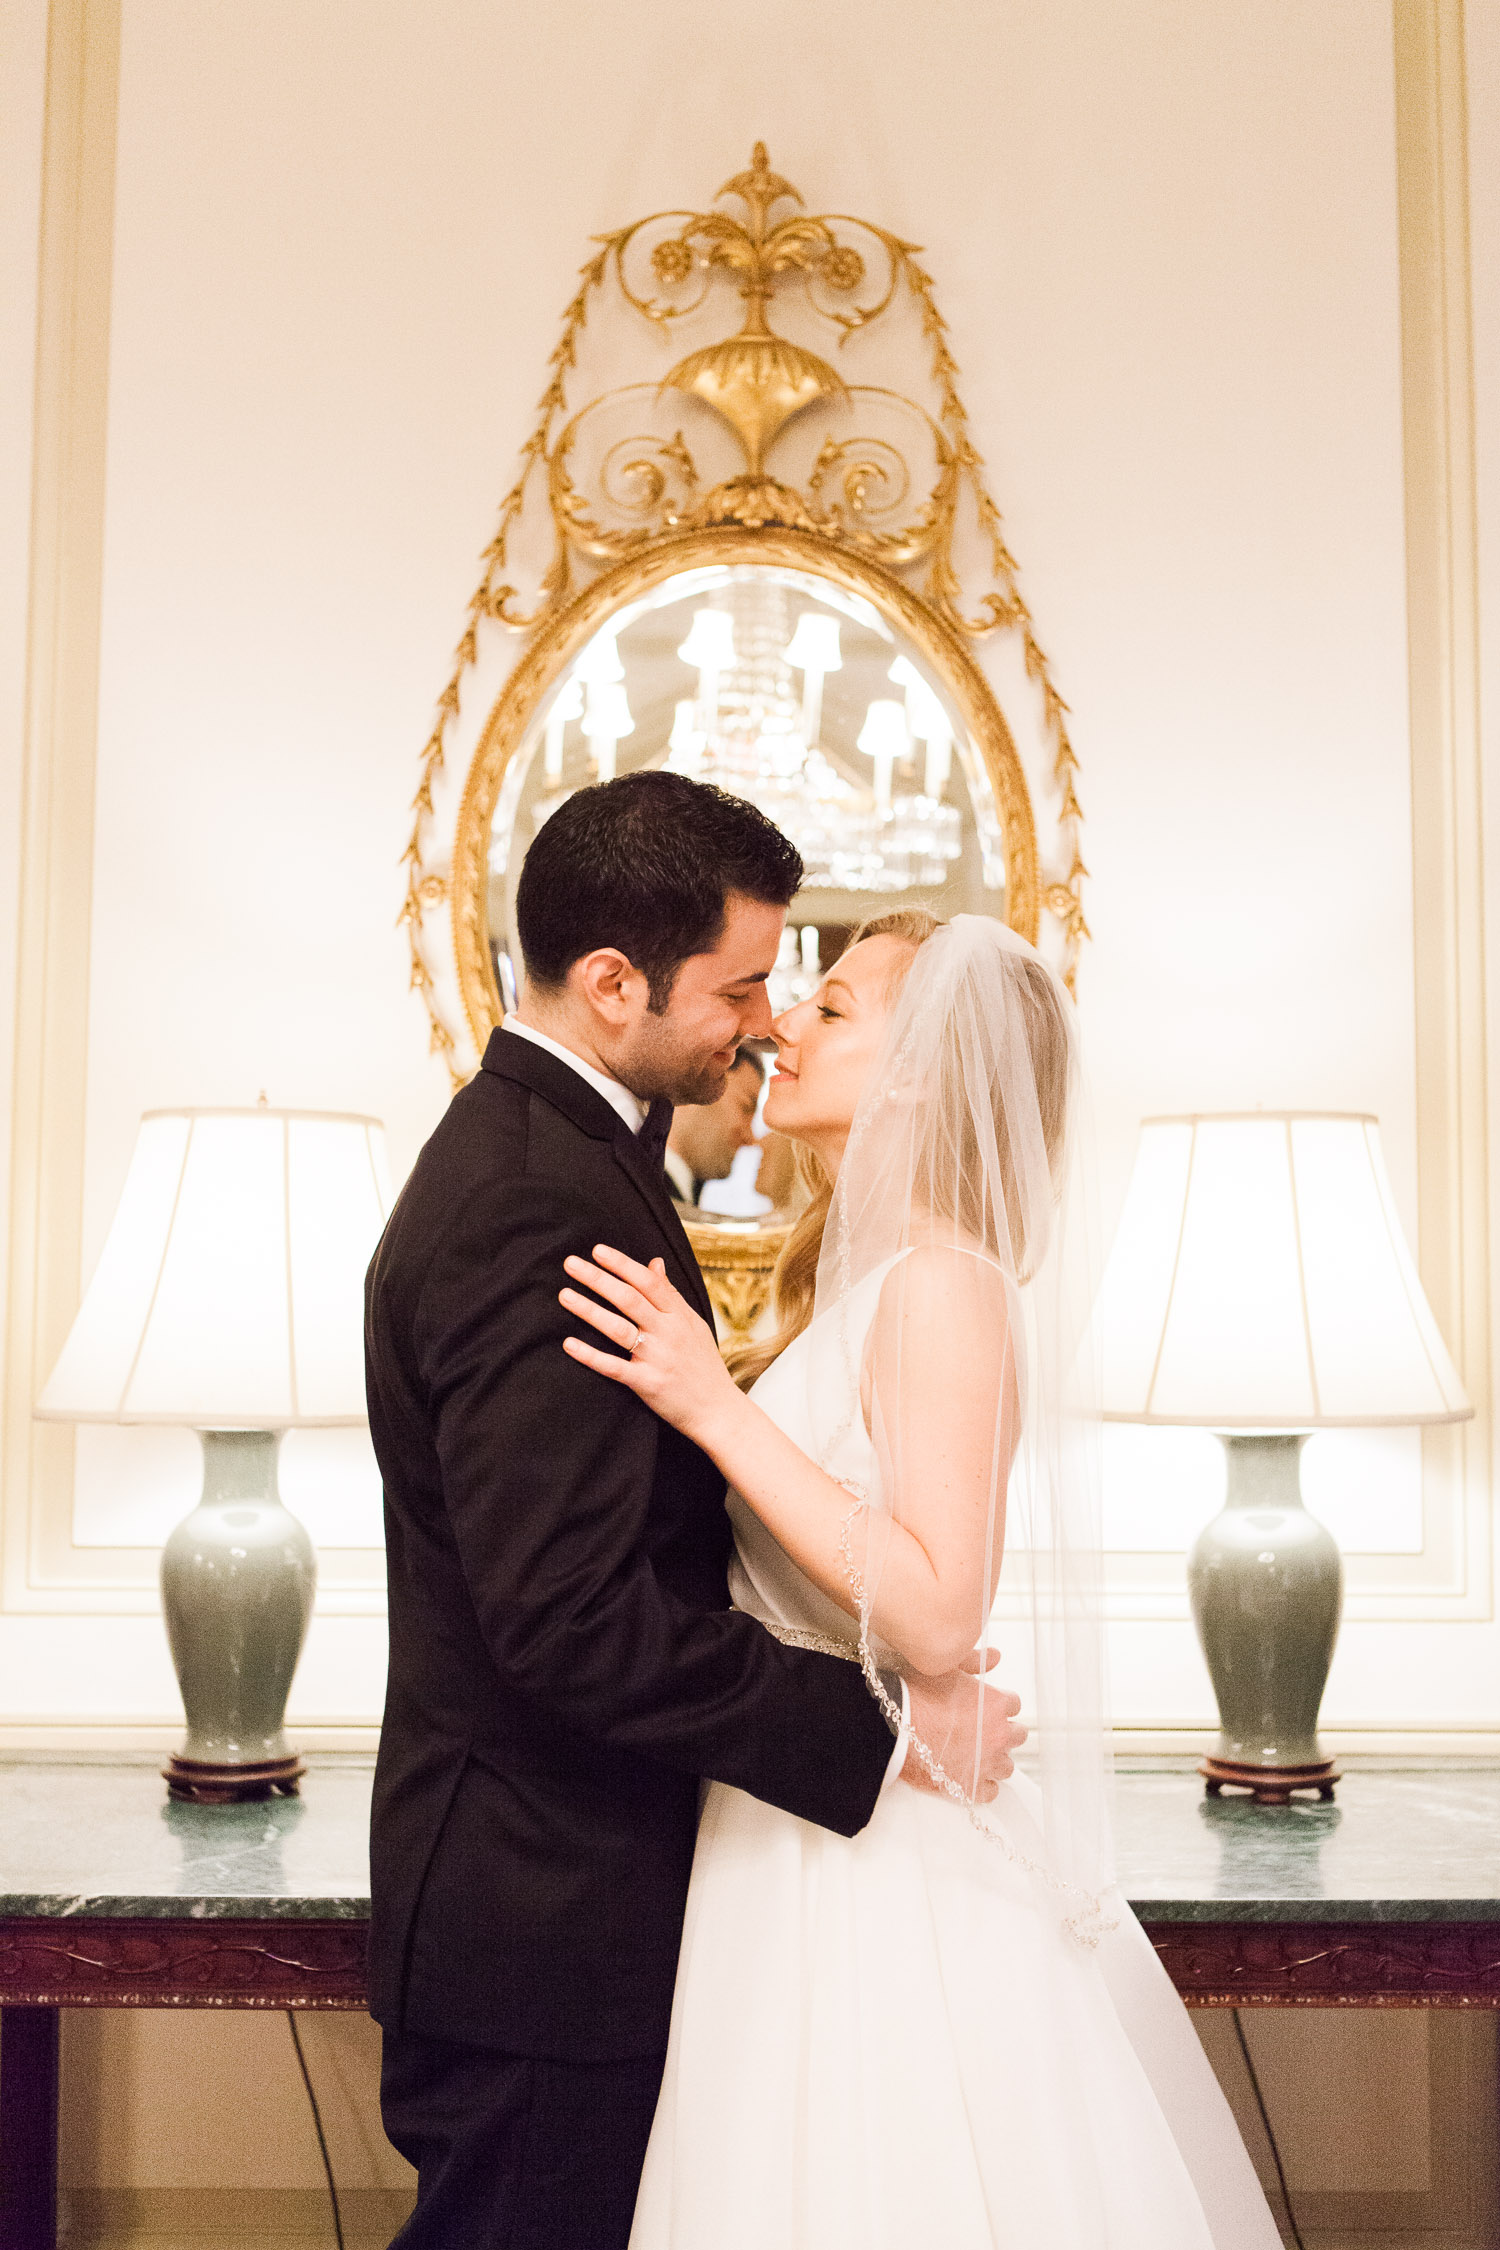 Lauren and Eric married at the Harold Pratt House